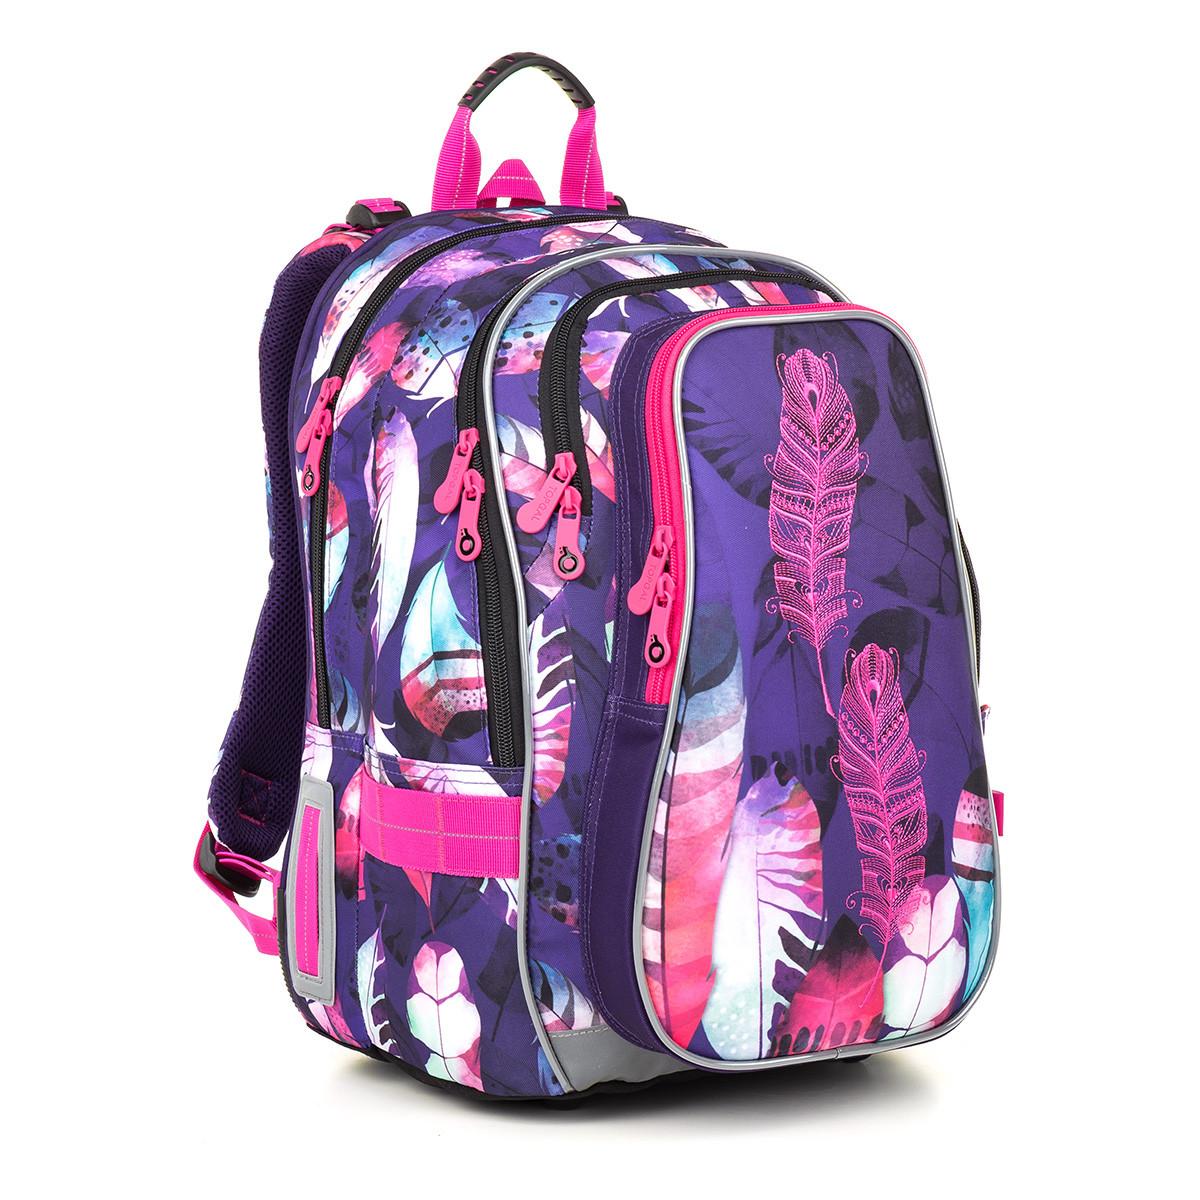 Školní batoh Topgal - LYNN 18009 G  73028959aa